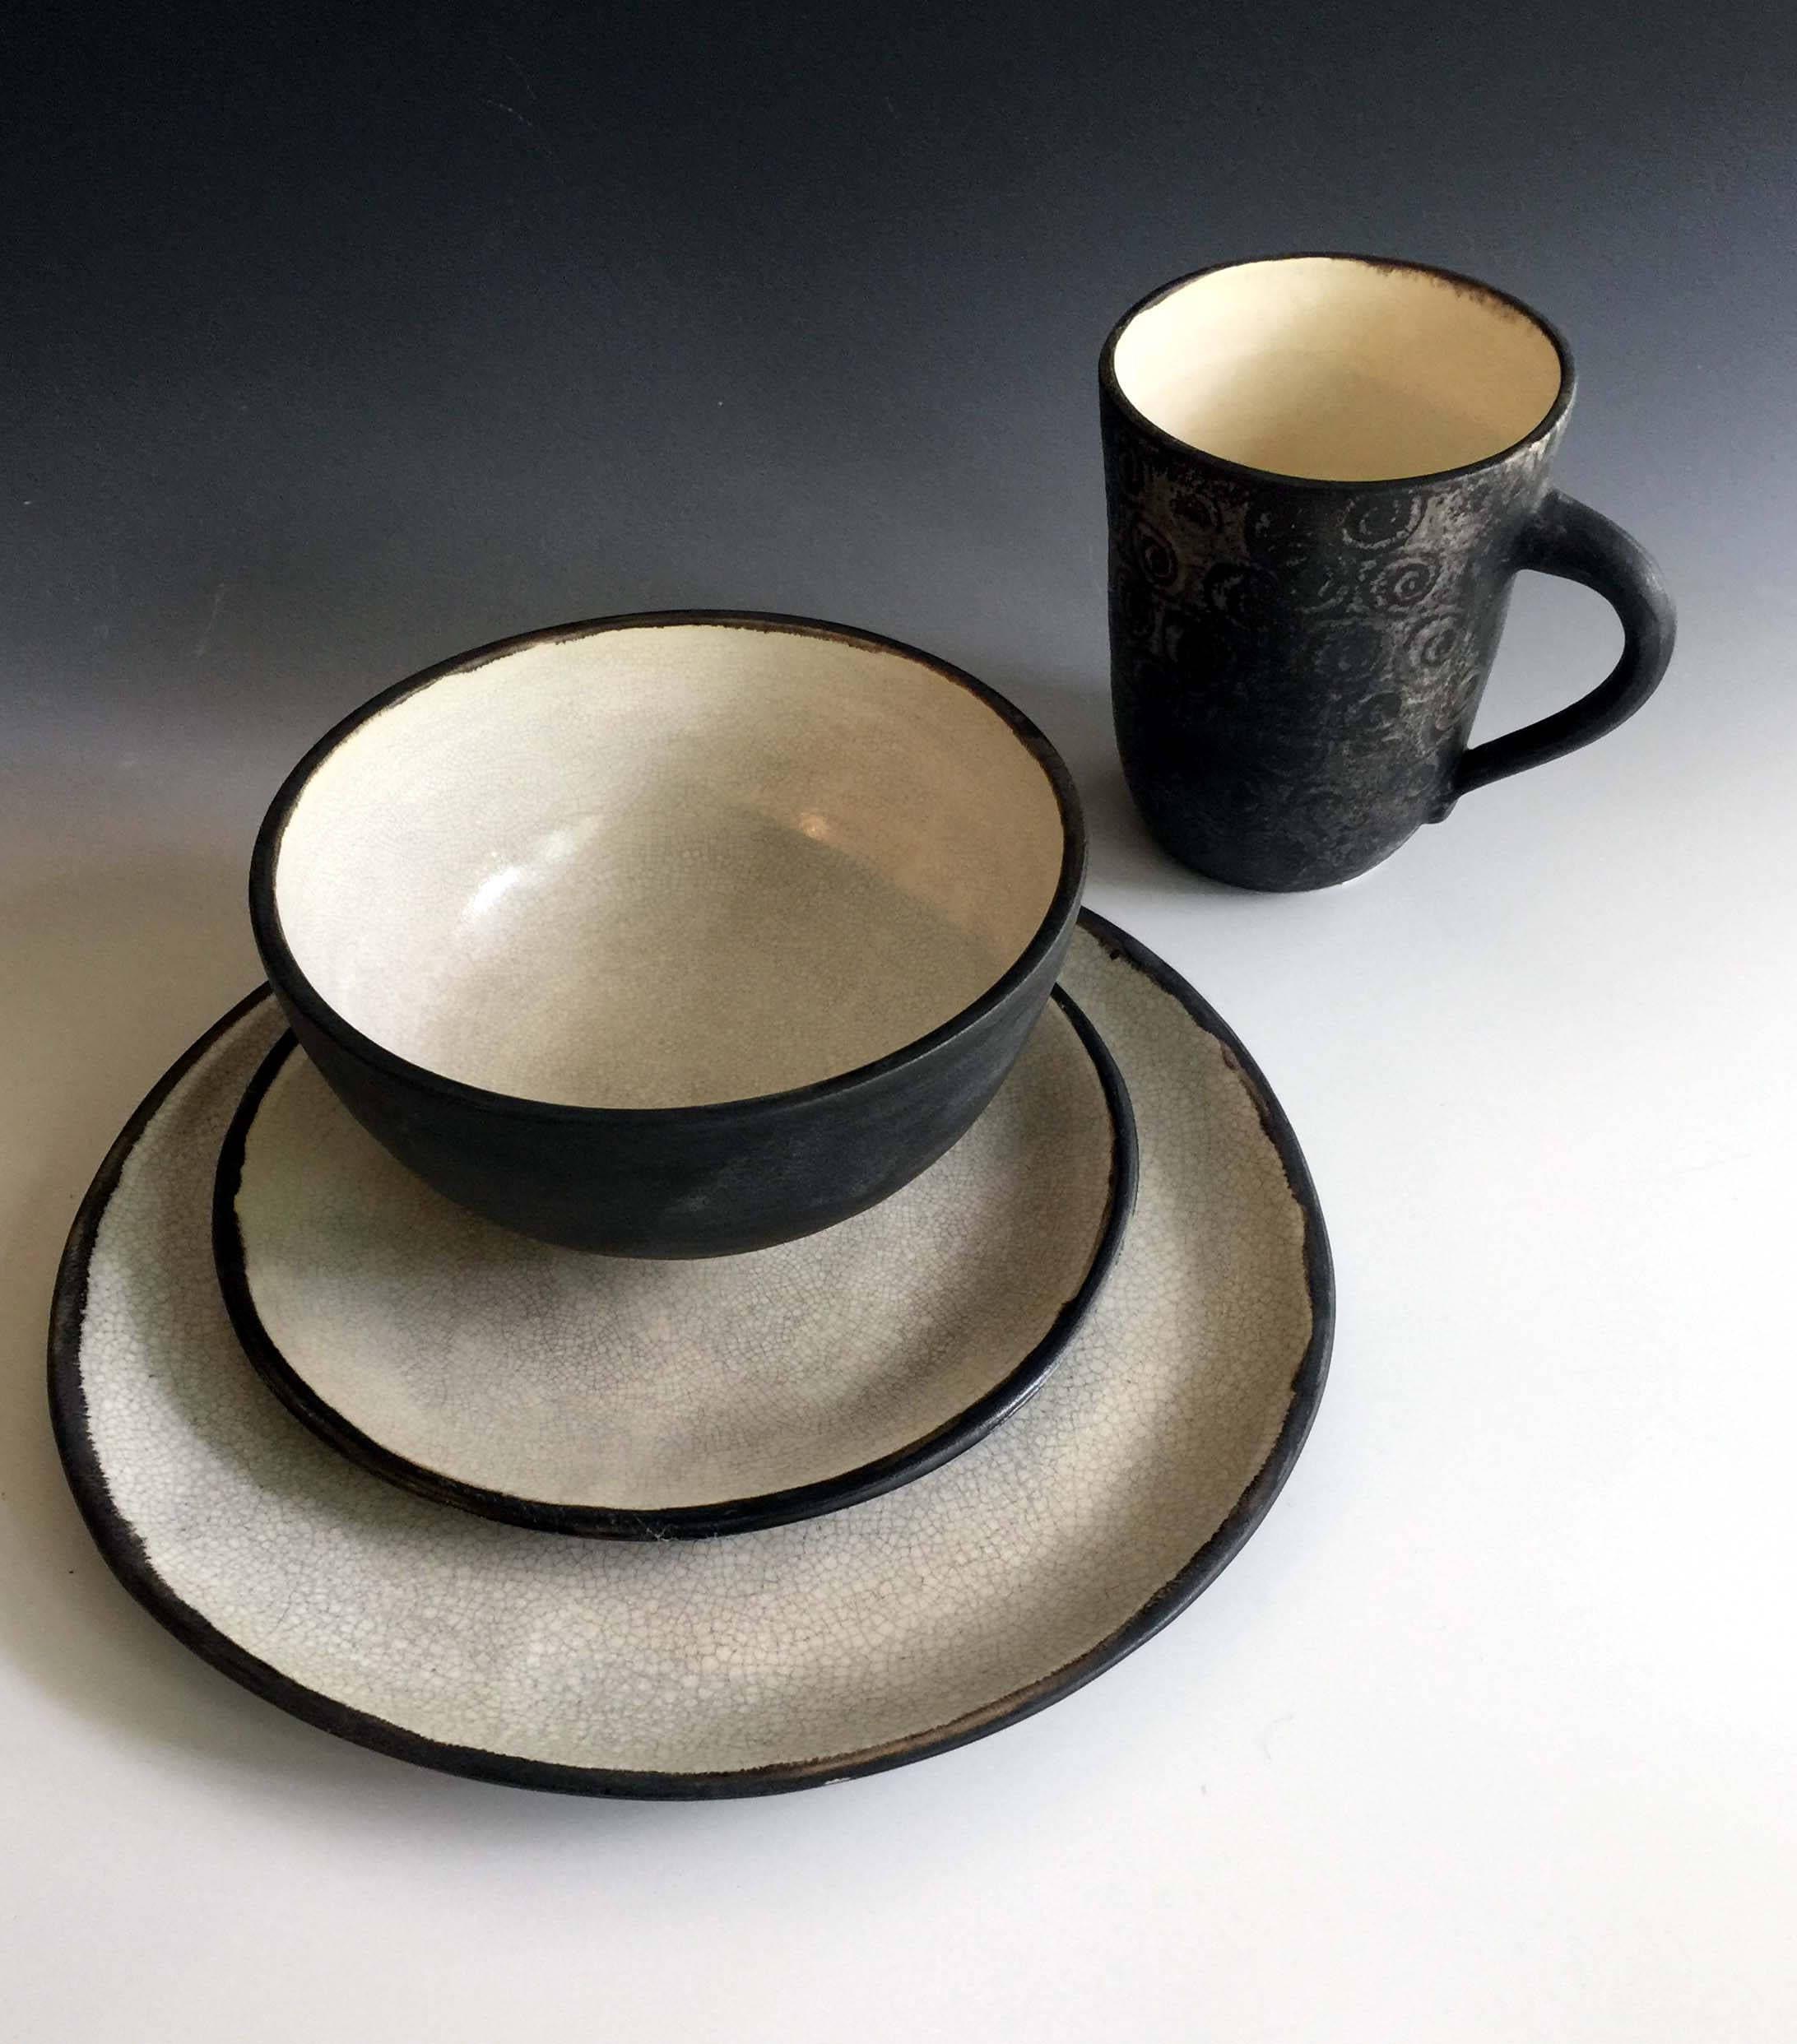 new black and white dinnerware sets in matte glaze by leslie. Black Bedroom Furniture Sets. Home Design Ideas